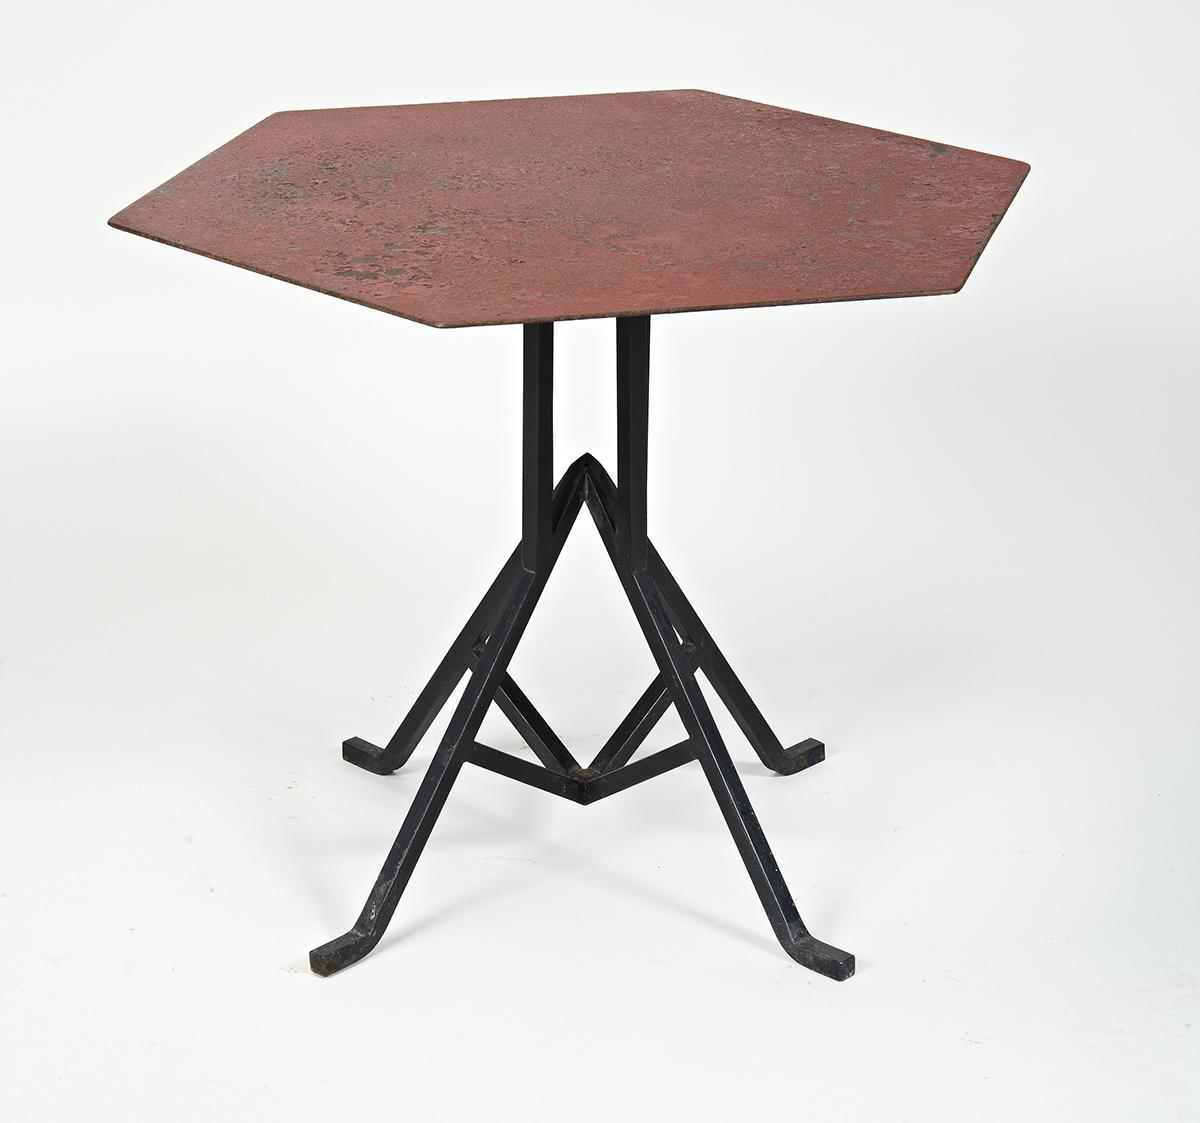 Frank Lloyd Wright iron table angle.jpg